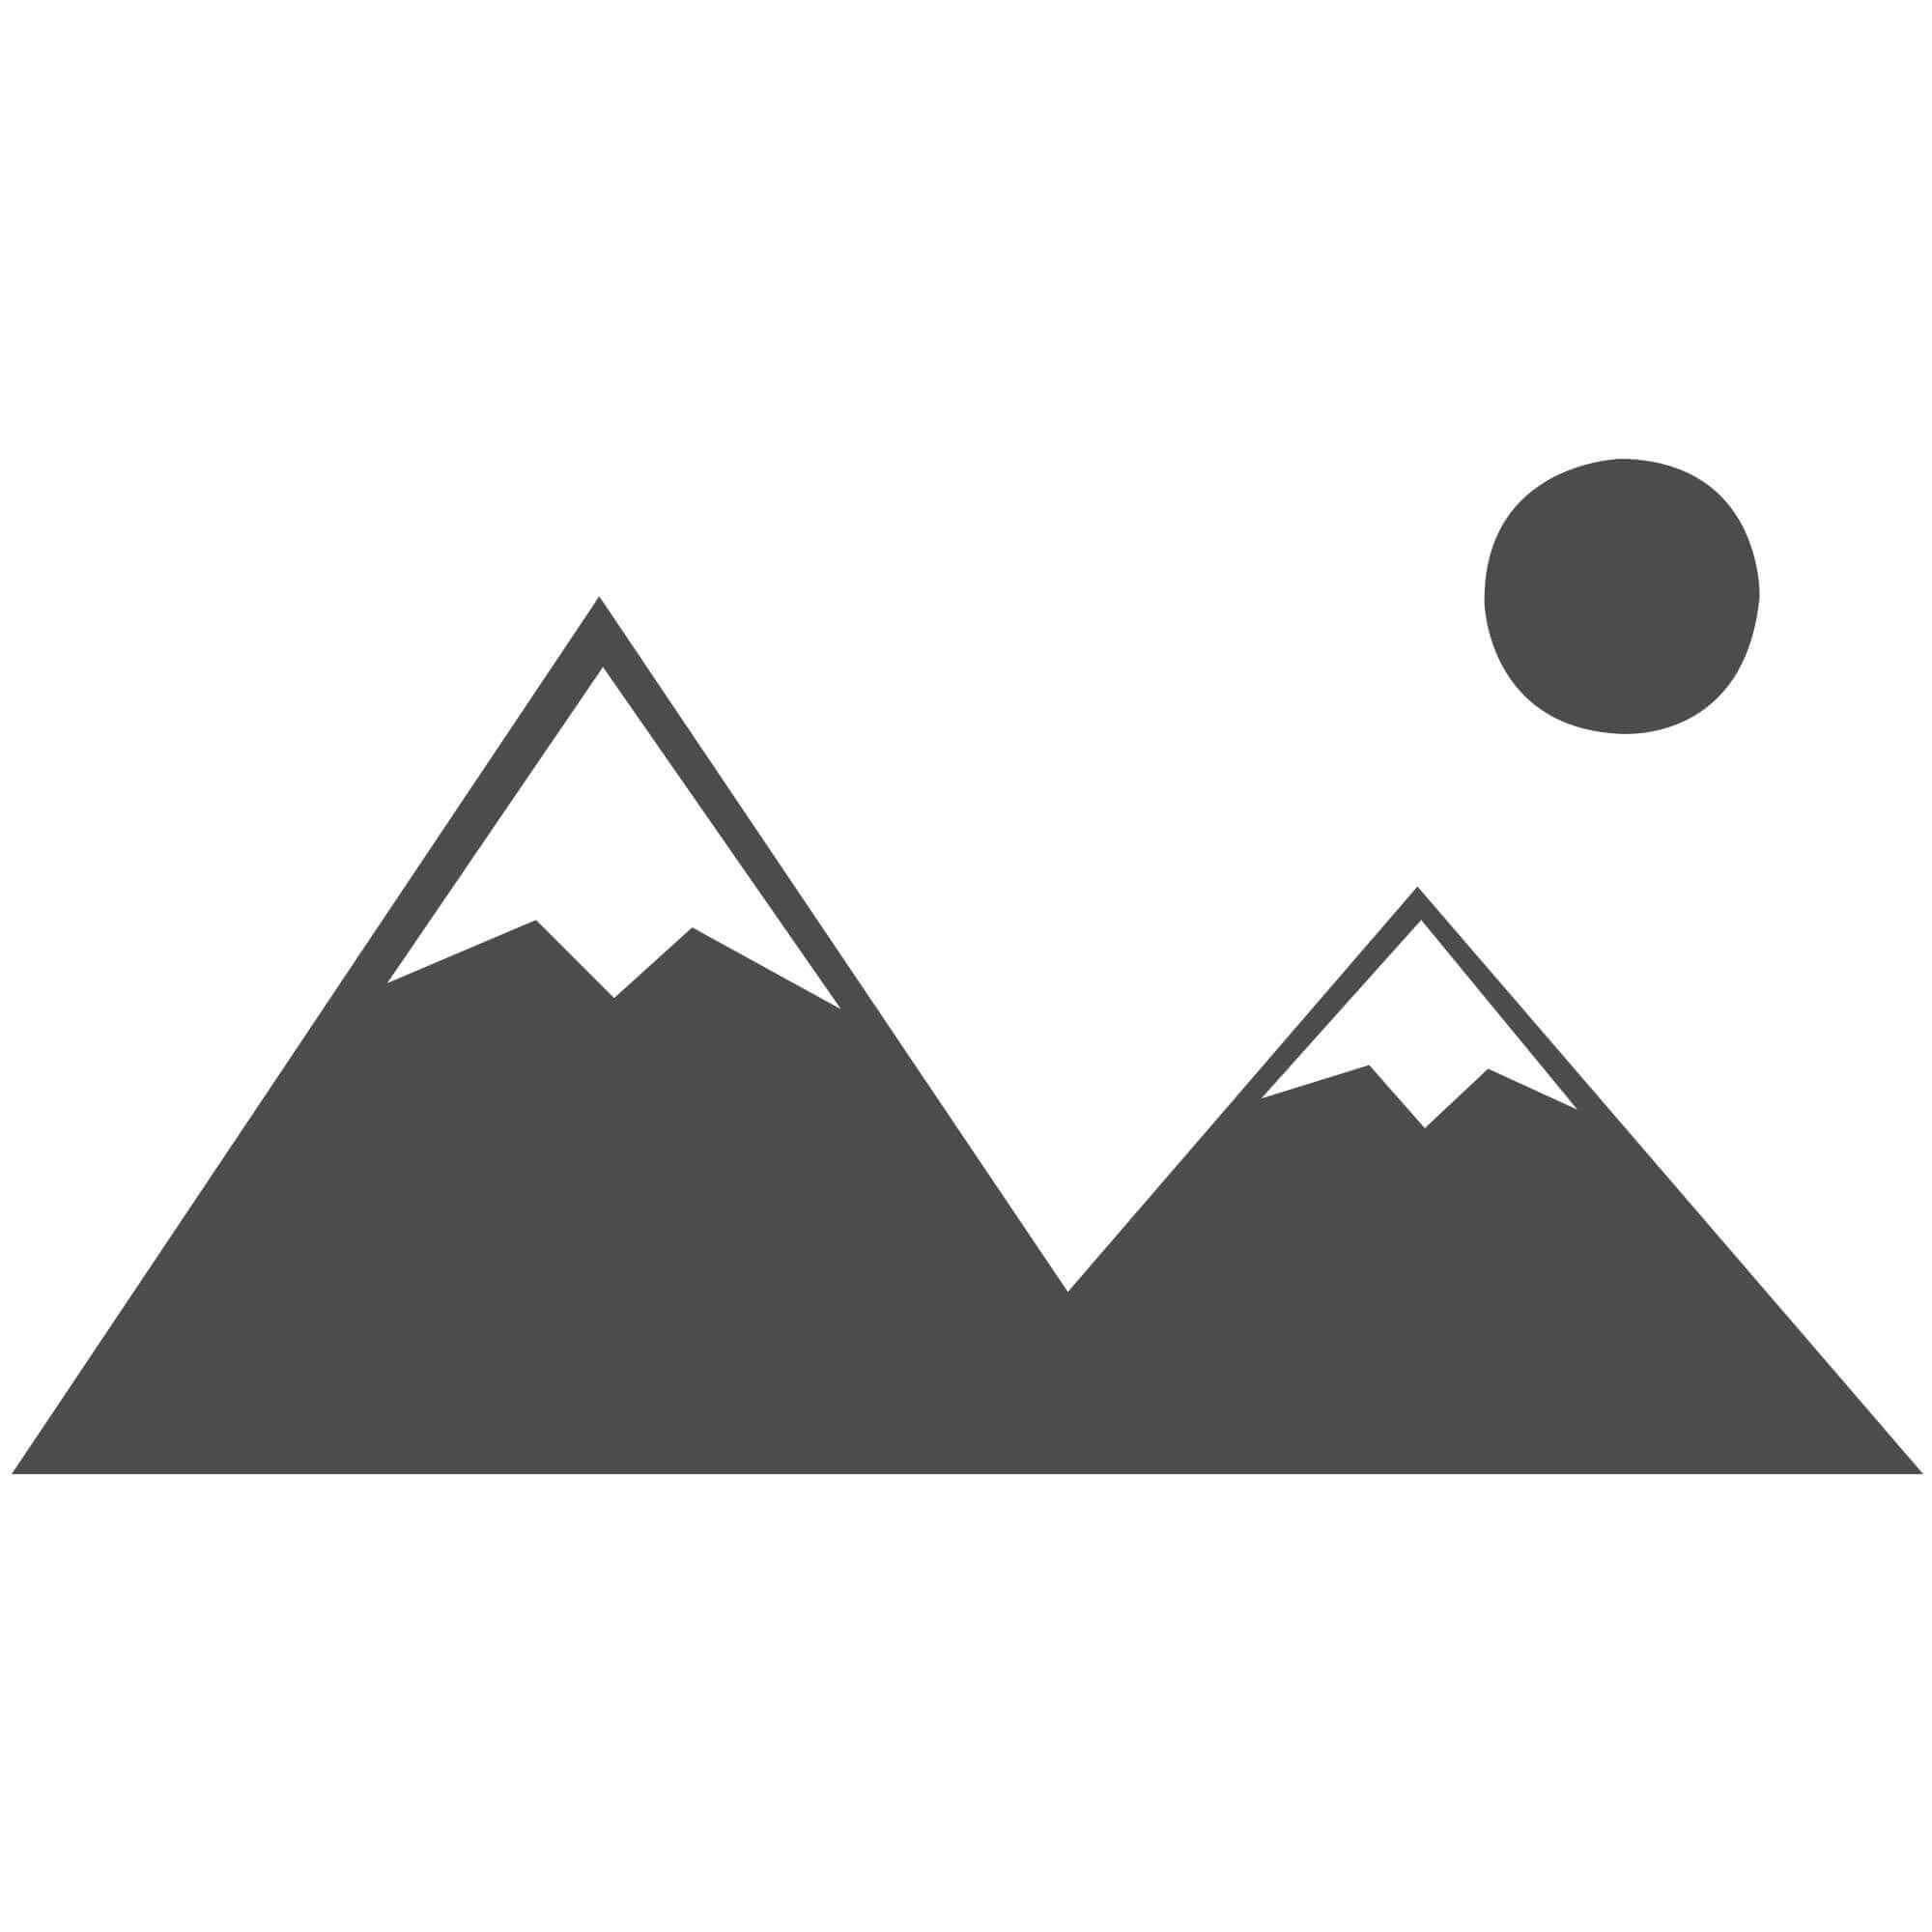 "Verge Lattice Brown Bronze Rug - Size 120 x 170 cm (4' x 5'7"")"